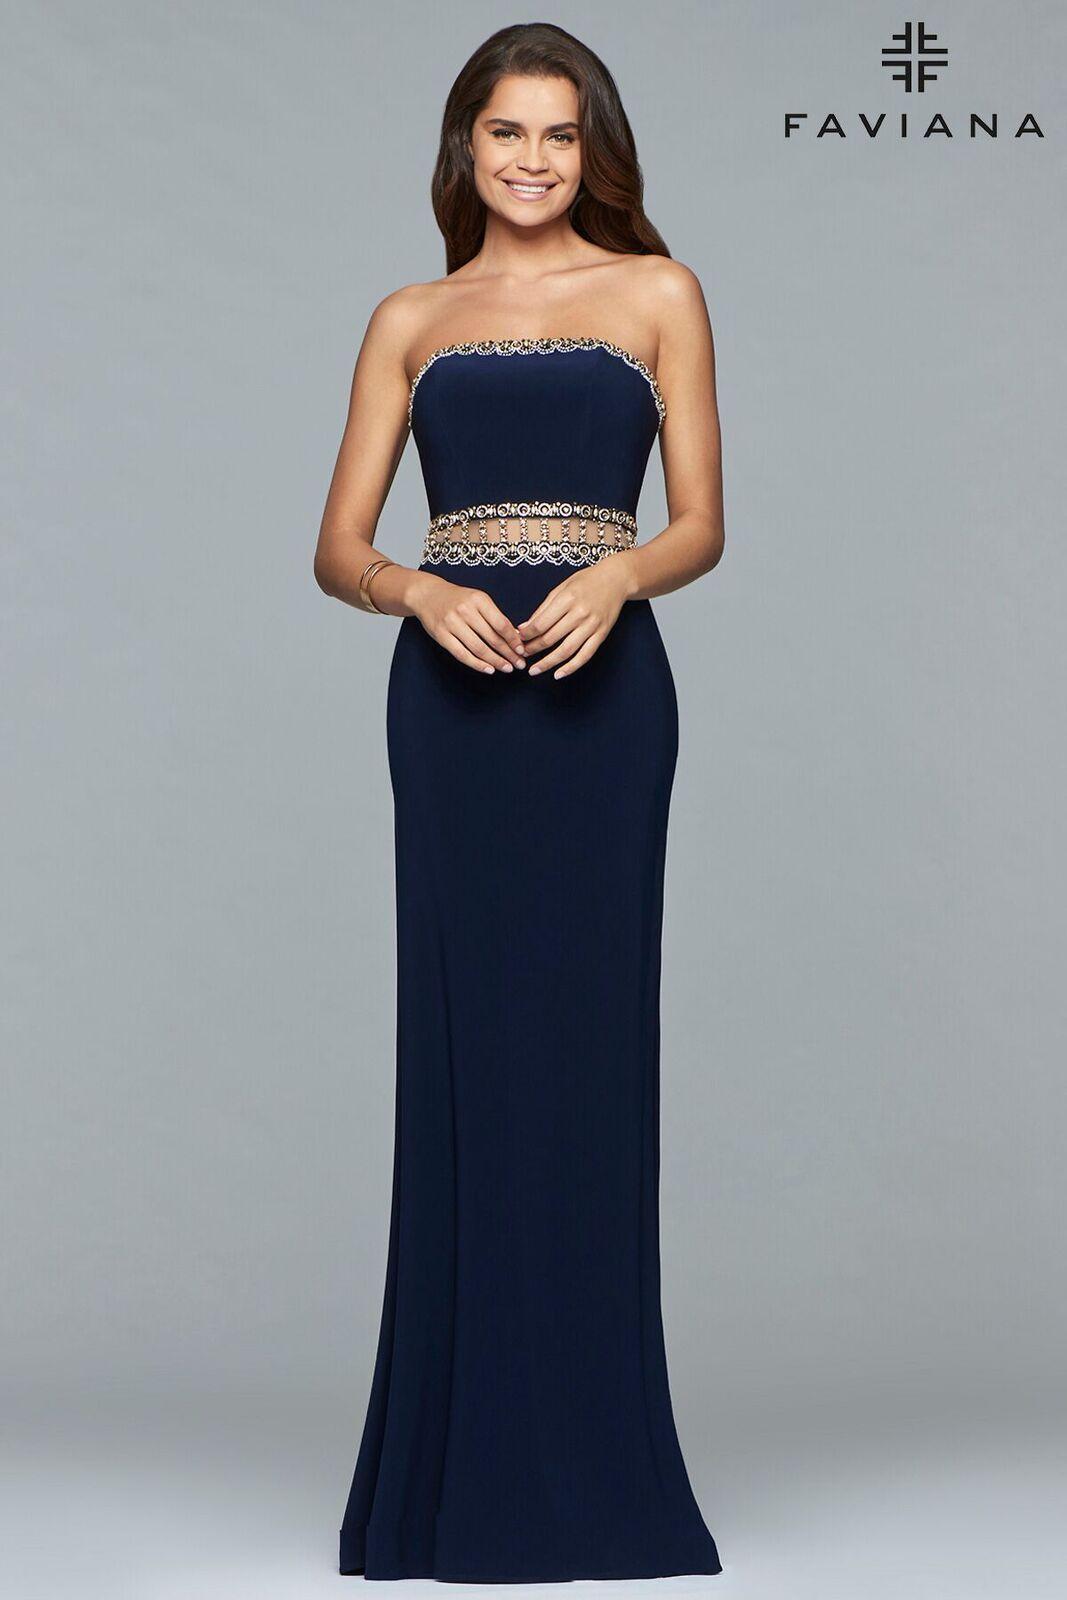 S in mollyus prom pinterest dresses prom dresses